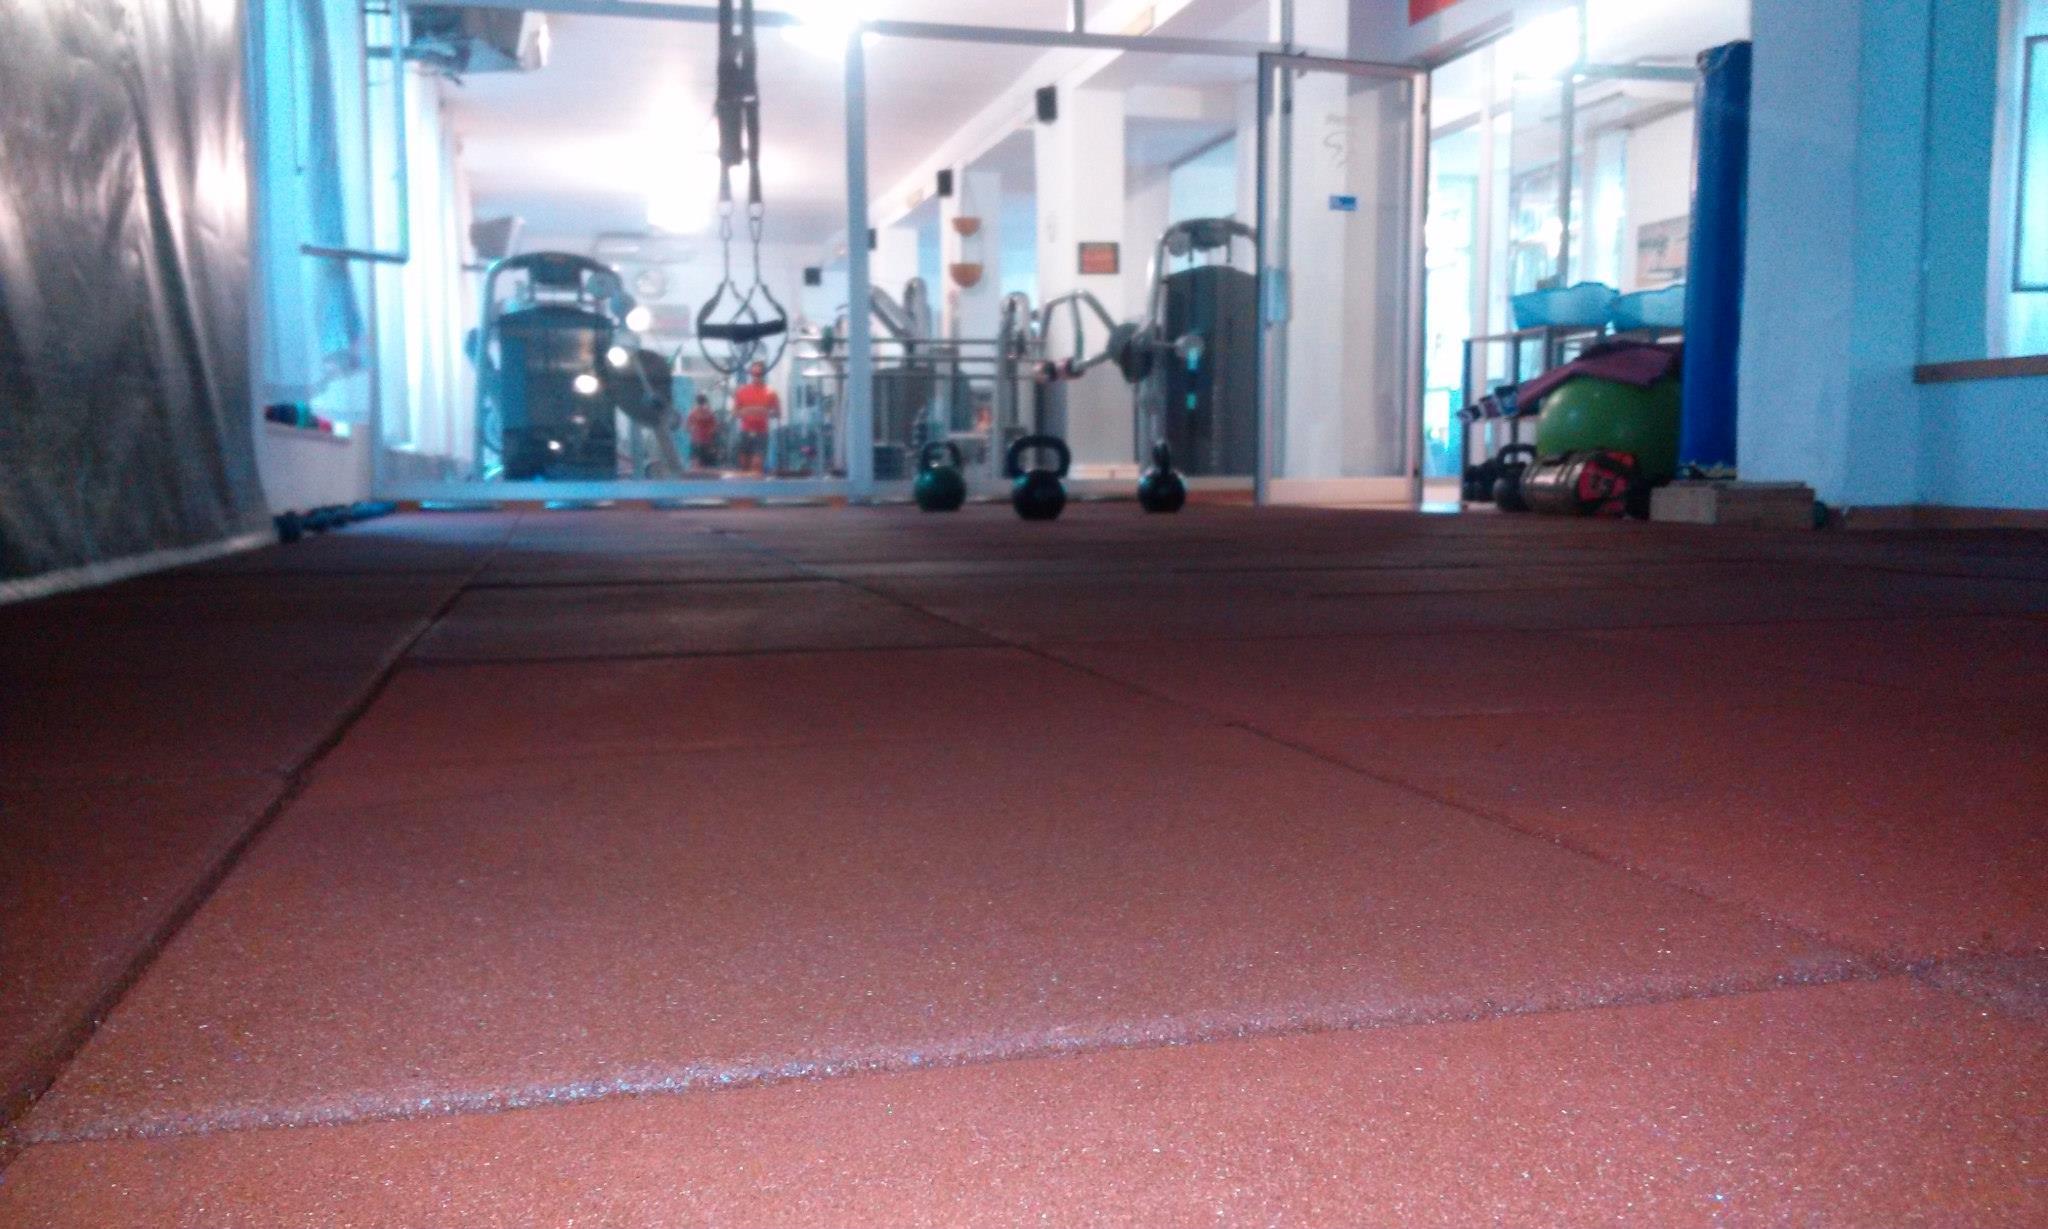 Pavimento crossfit anti shock per palestre